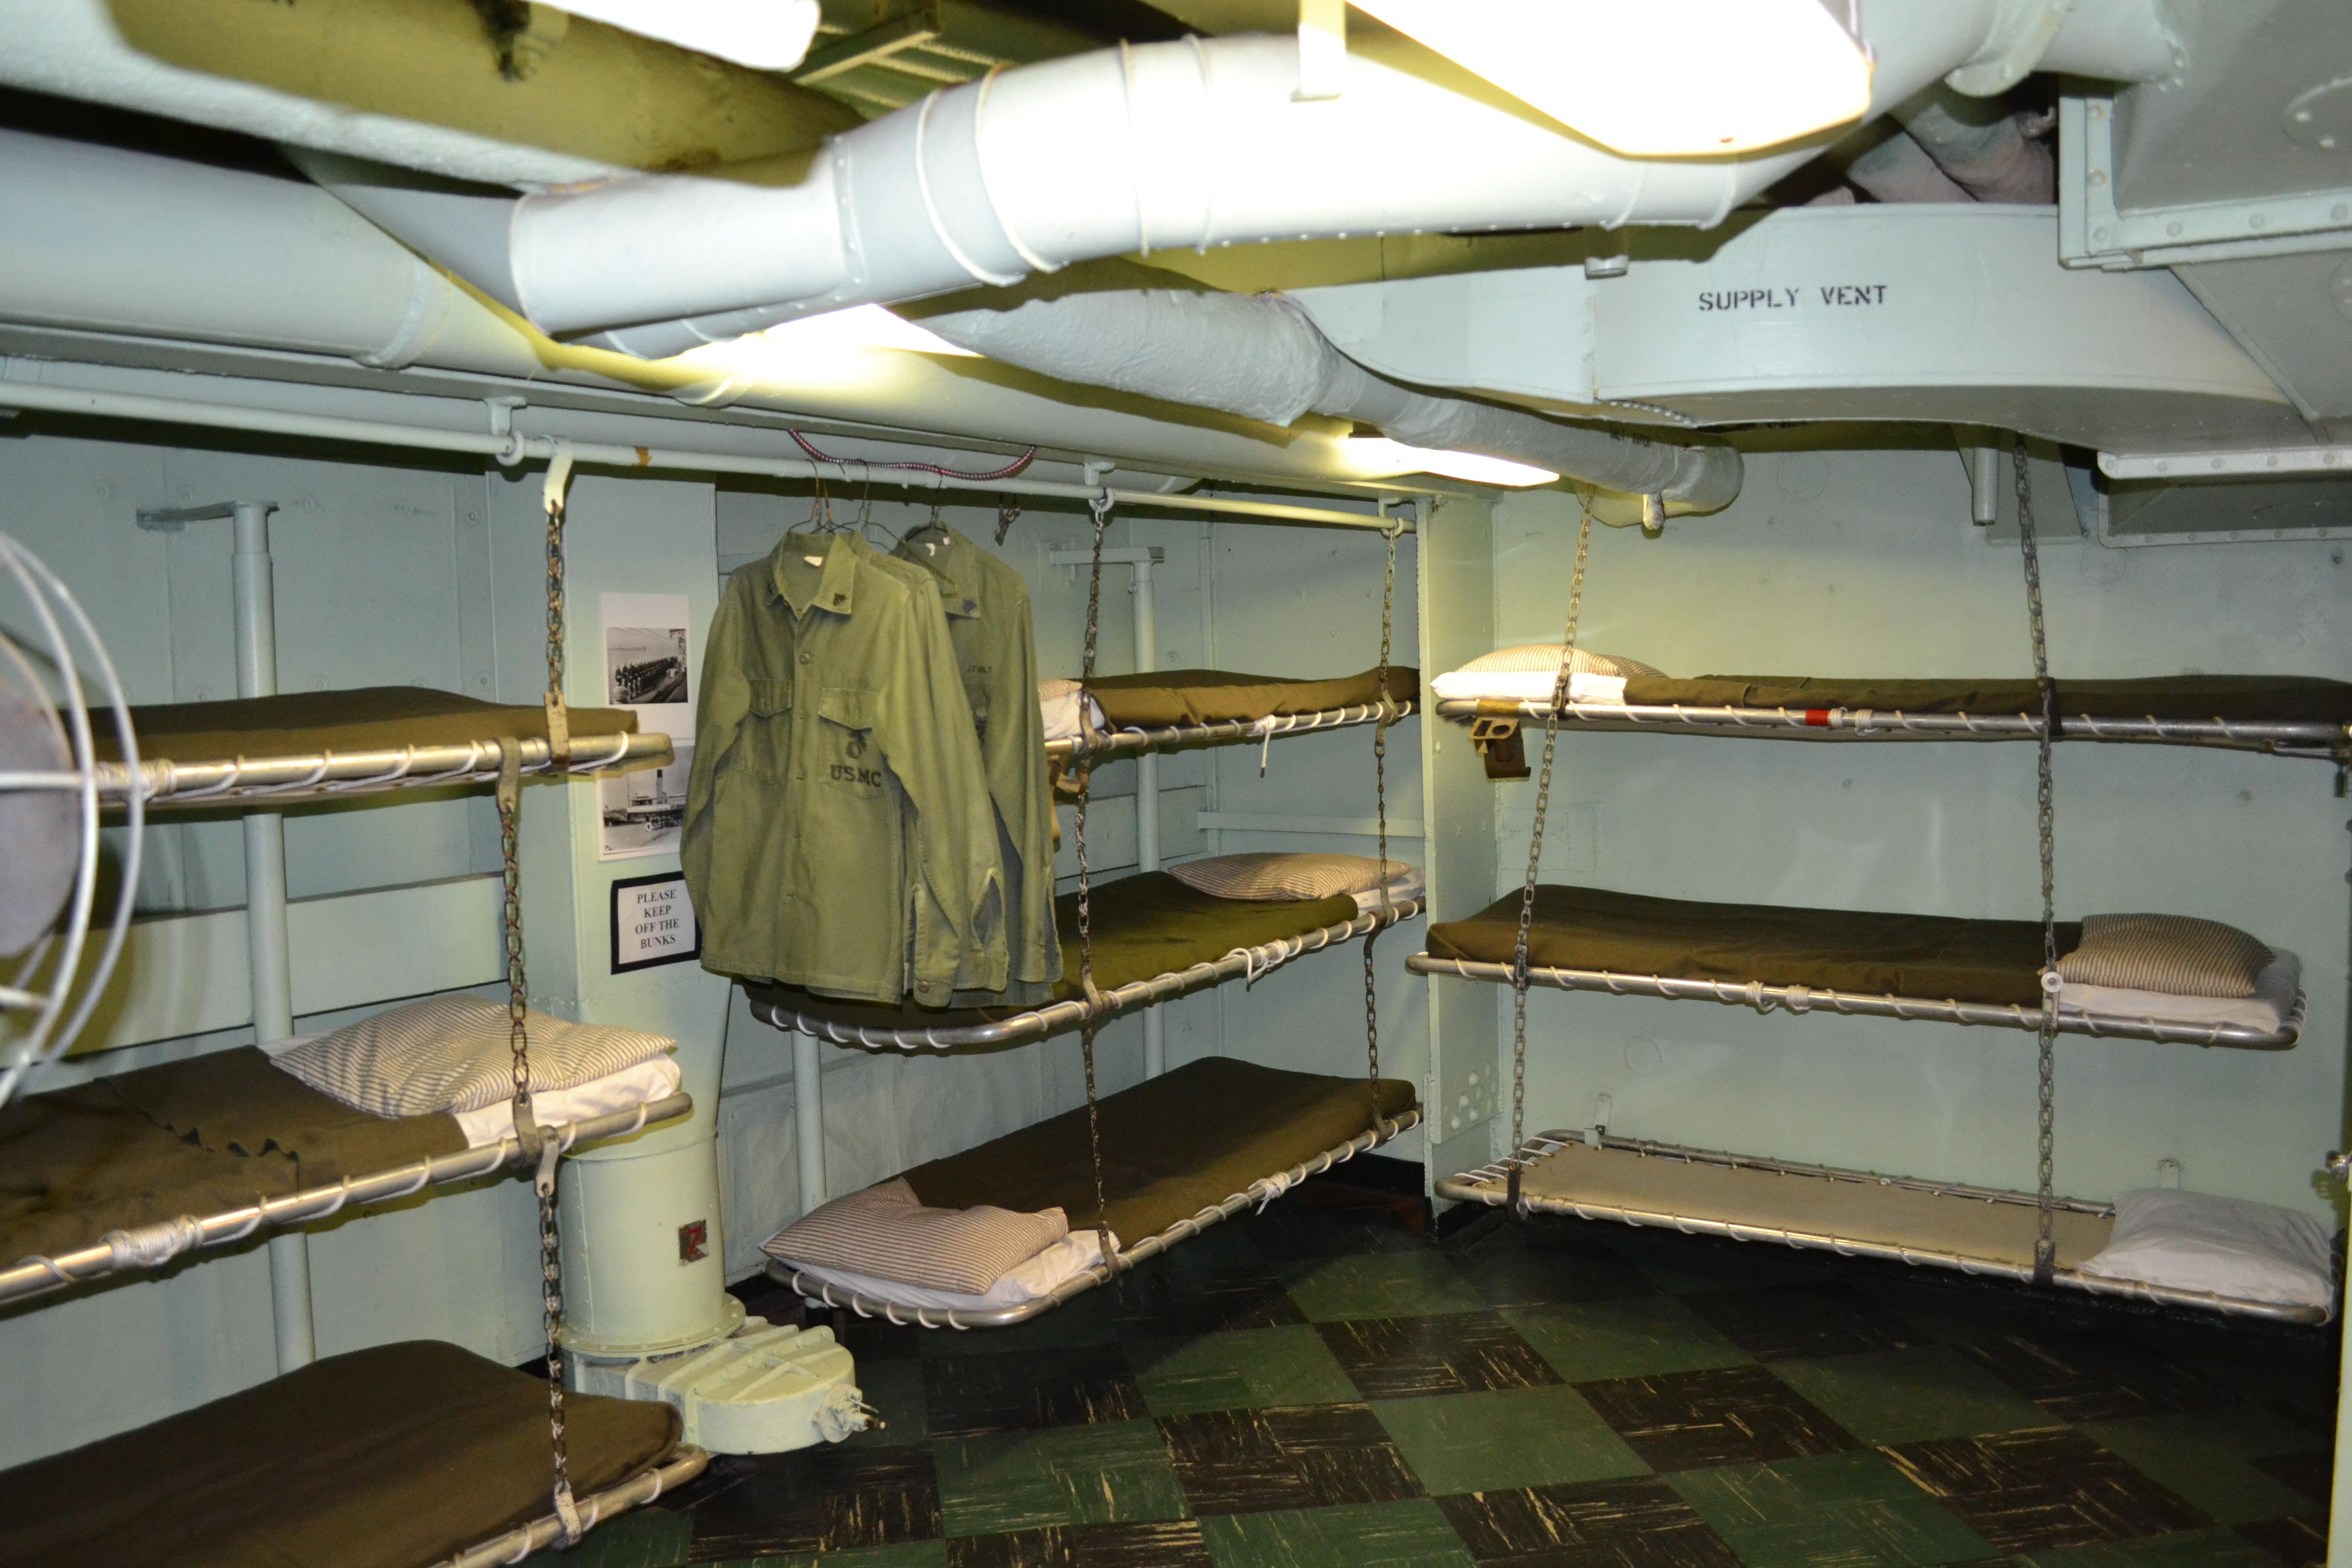 astronauts sleeping compartment - photo #3